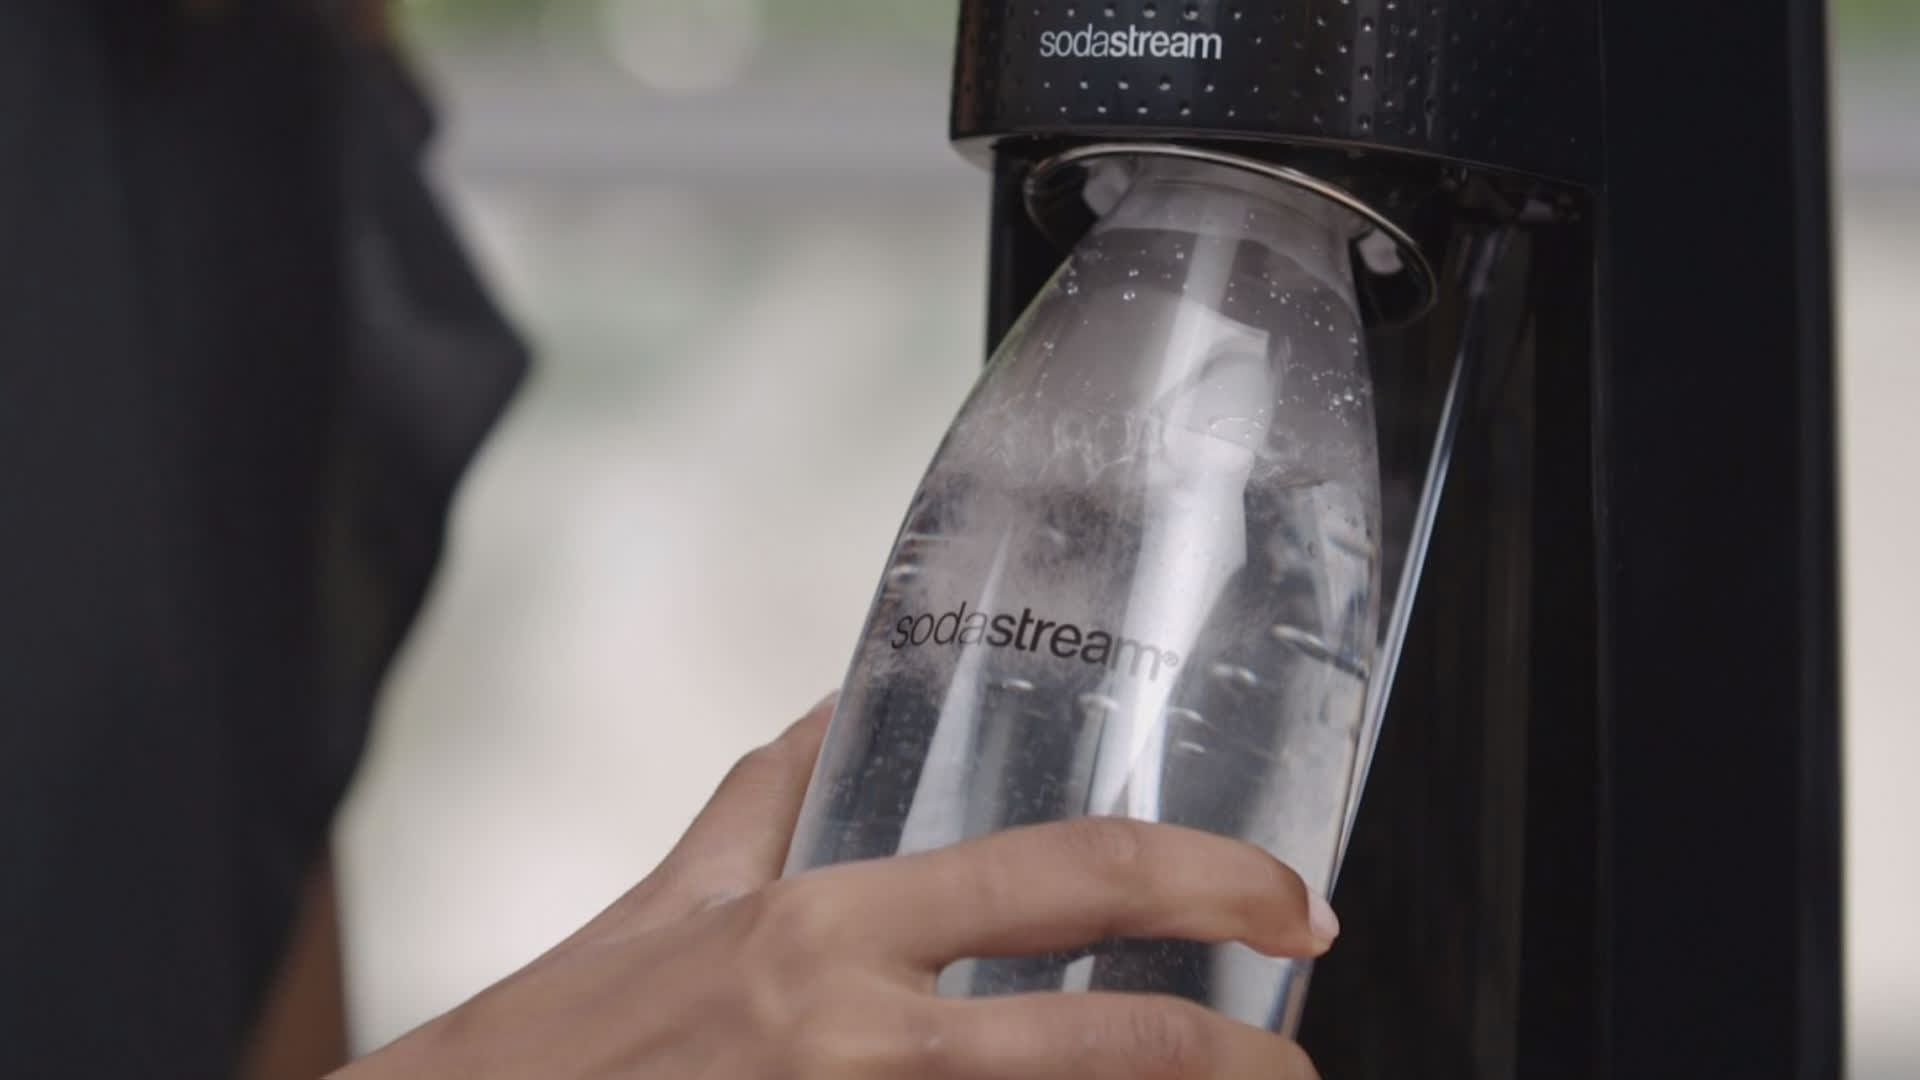 PepsiCo is buying SodaStream for $3 2 billion